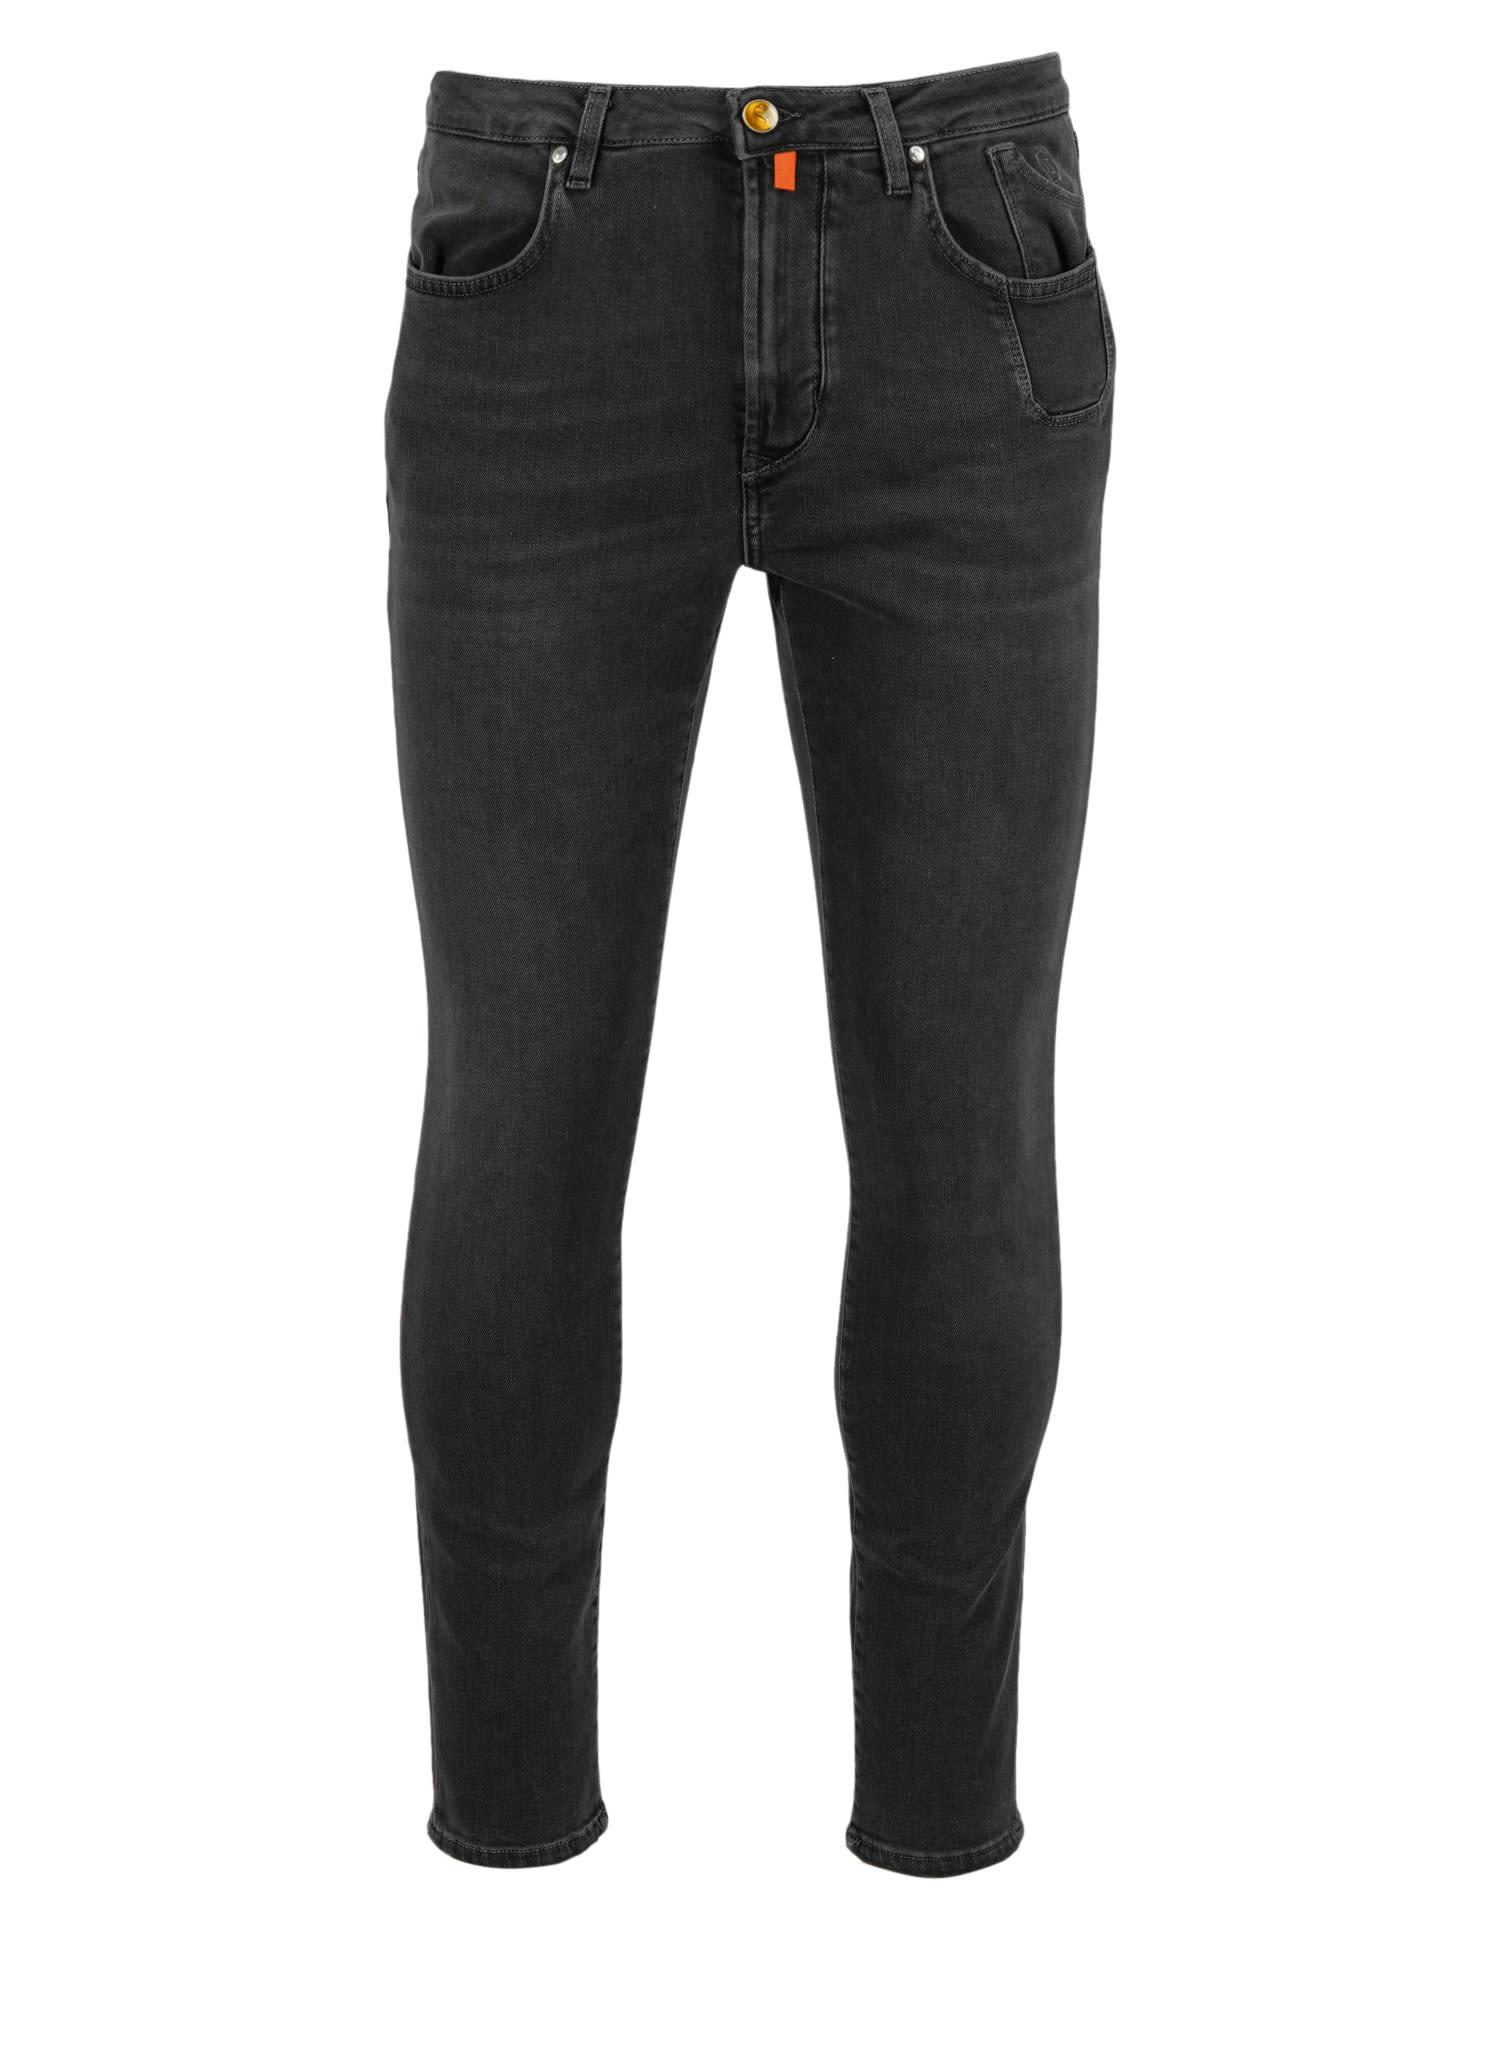 Pantal. Uomo Con Intarsio Jeans